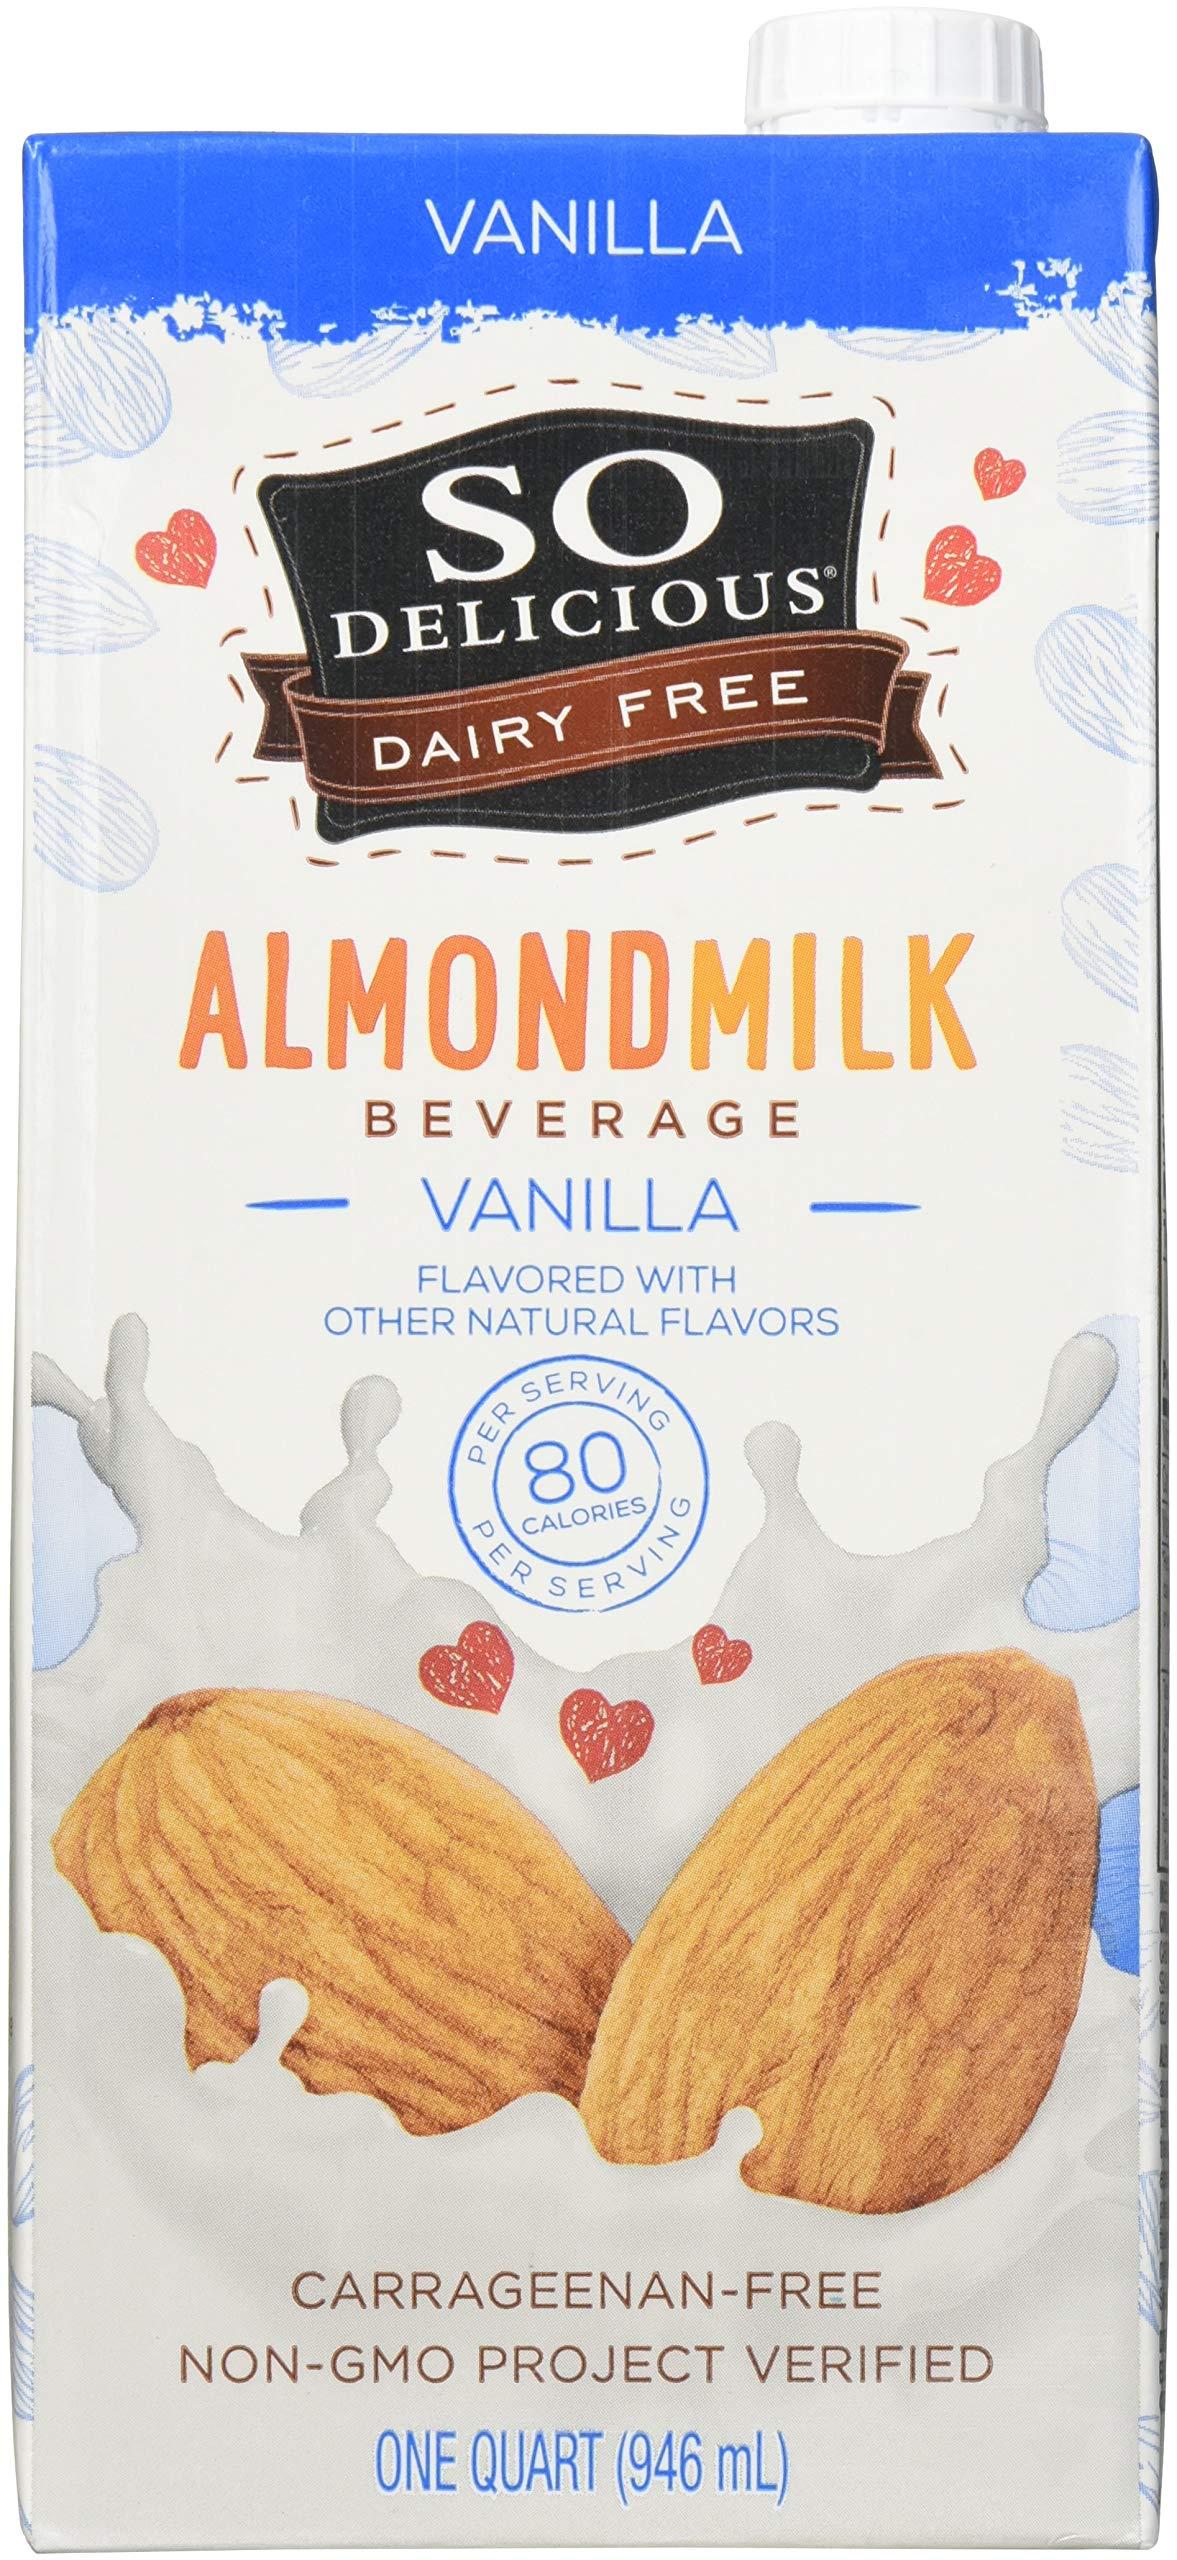 So Delicious, Almond Milk Vanilla Aseptic, 32 Fl Oz